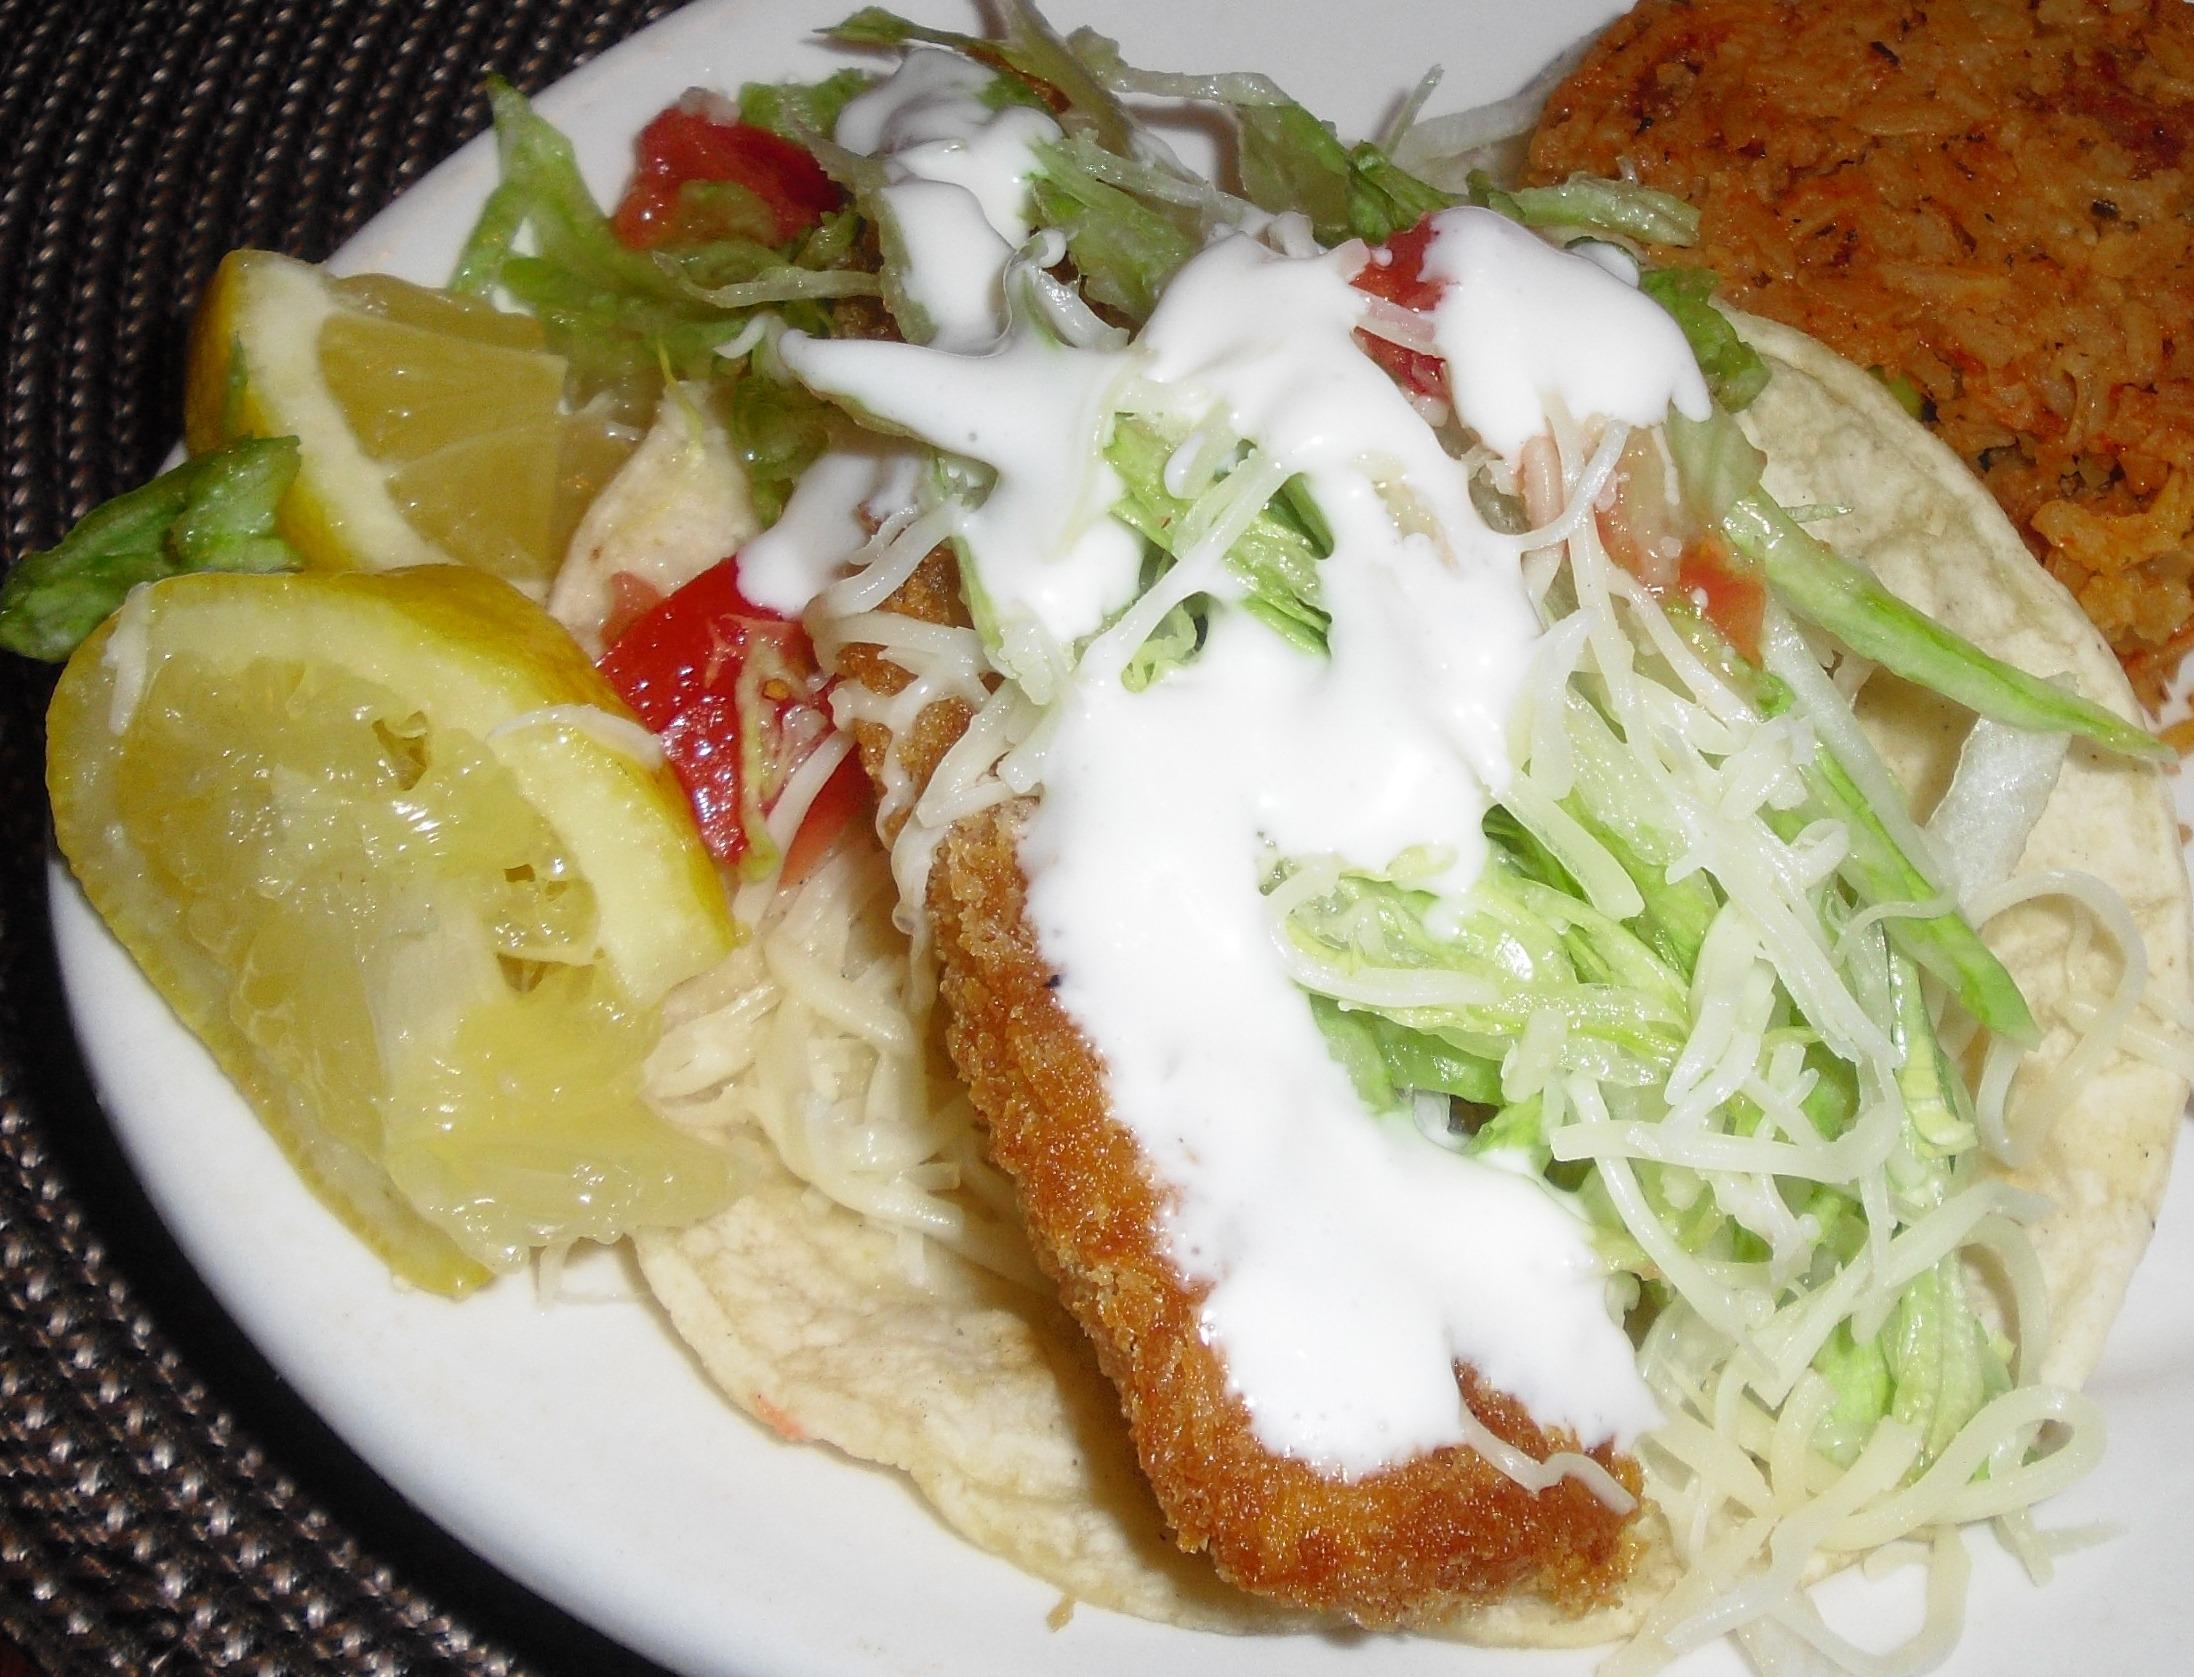 Fried fish tacos recipes for Fried fish taco recipe